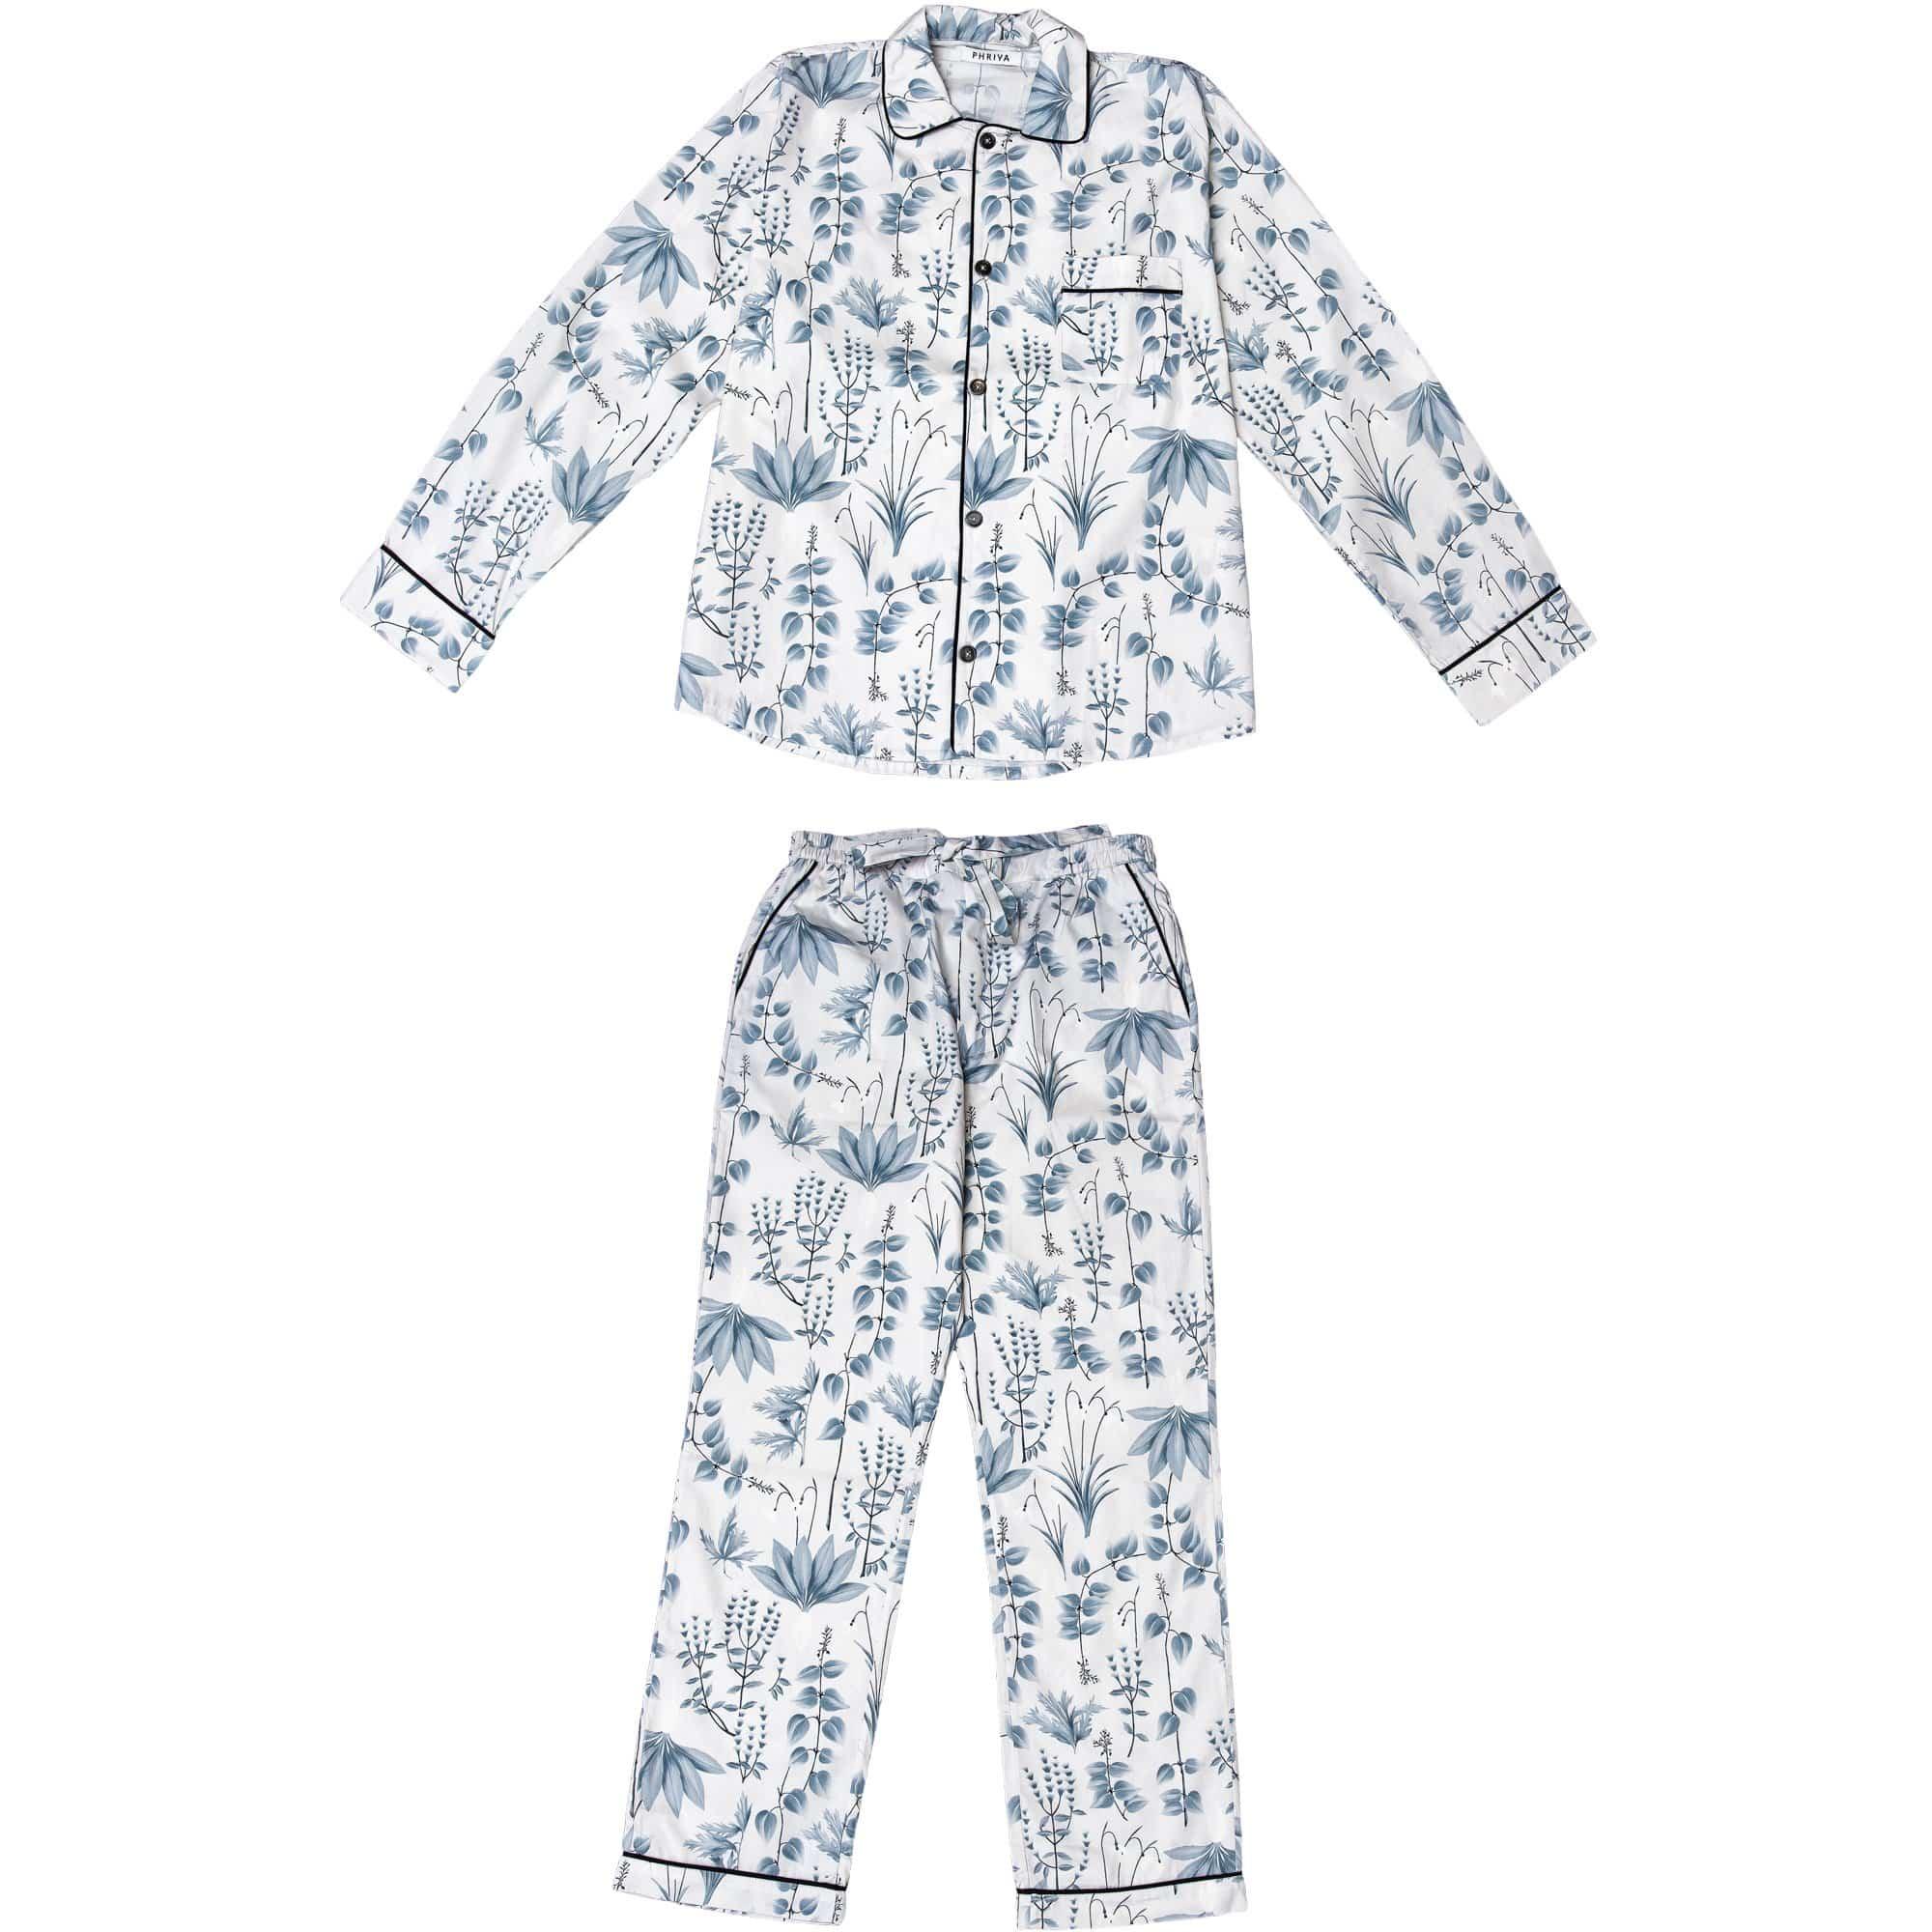 Phriya Men's Gray Circe's Garden Long Pajama Set  - multicolor - Size: One Size